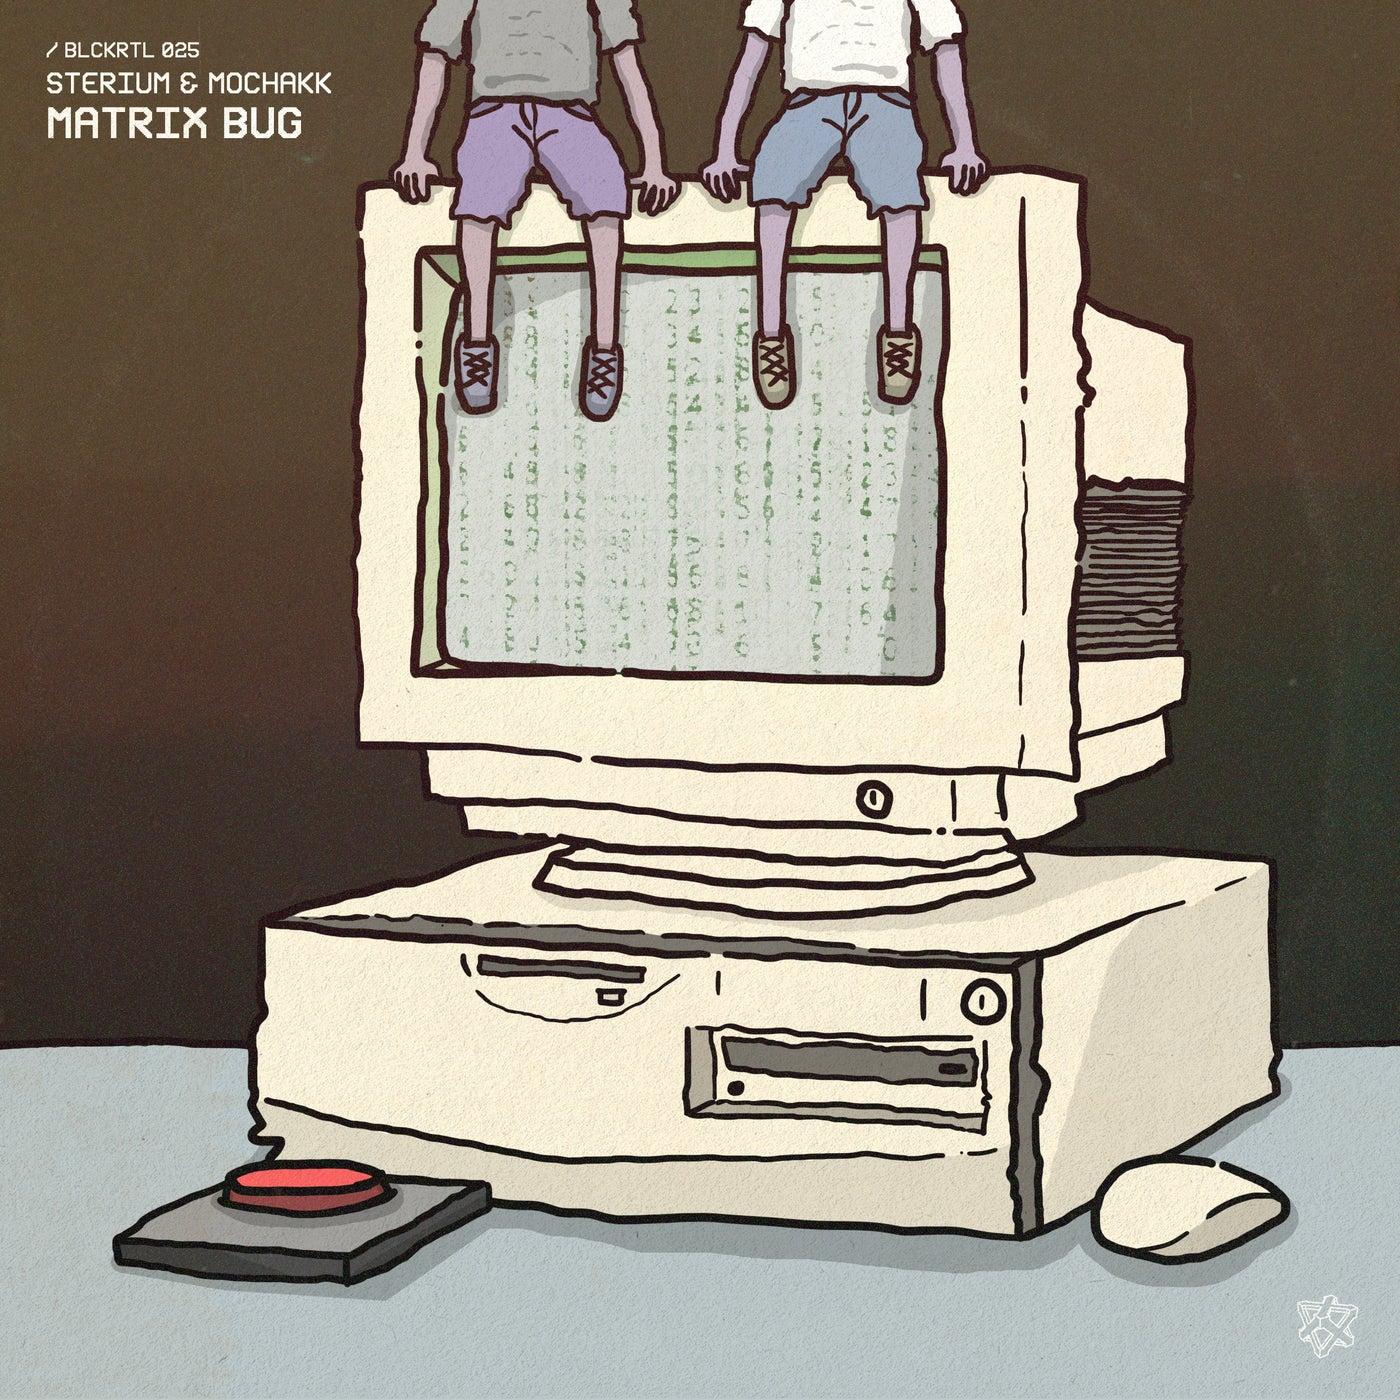 Matrix Bug (Original Mix)